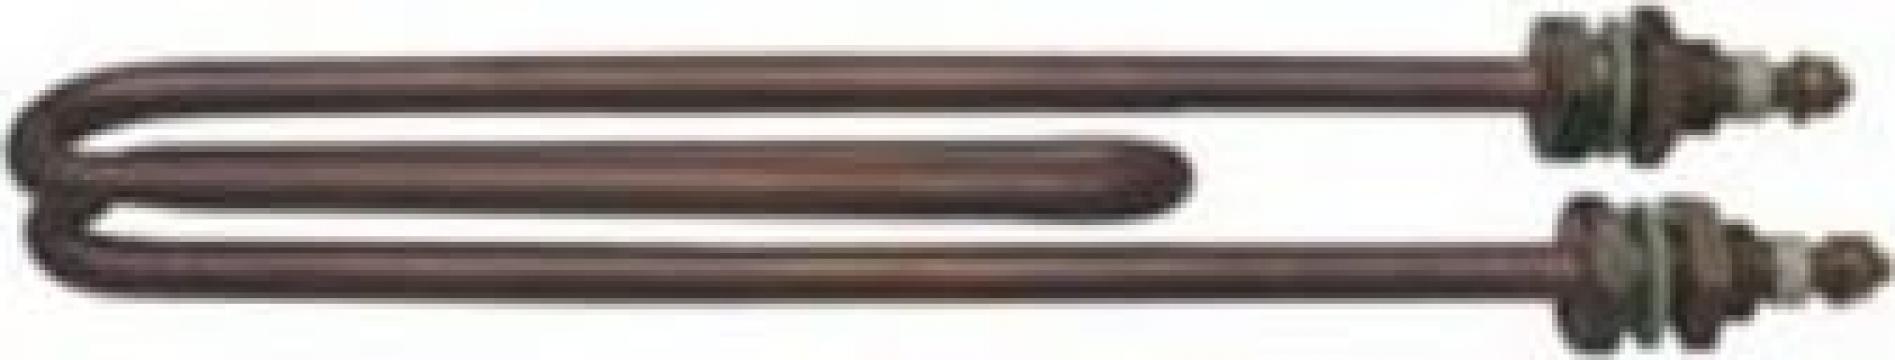 Rezistenta BM 230mm, 1500W, 3/8 de la Sercotex International Srl